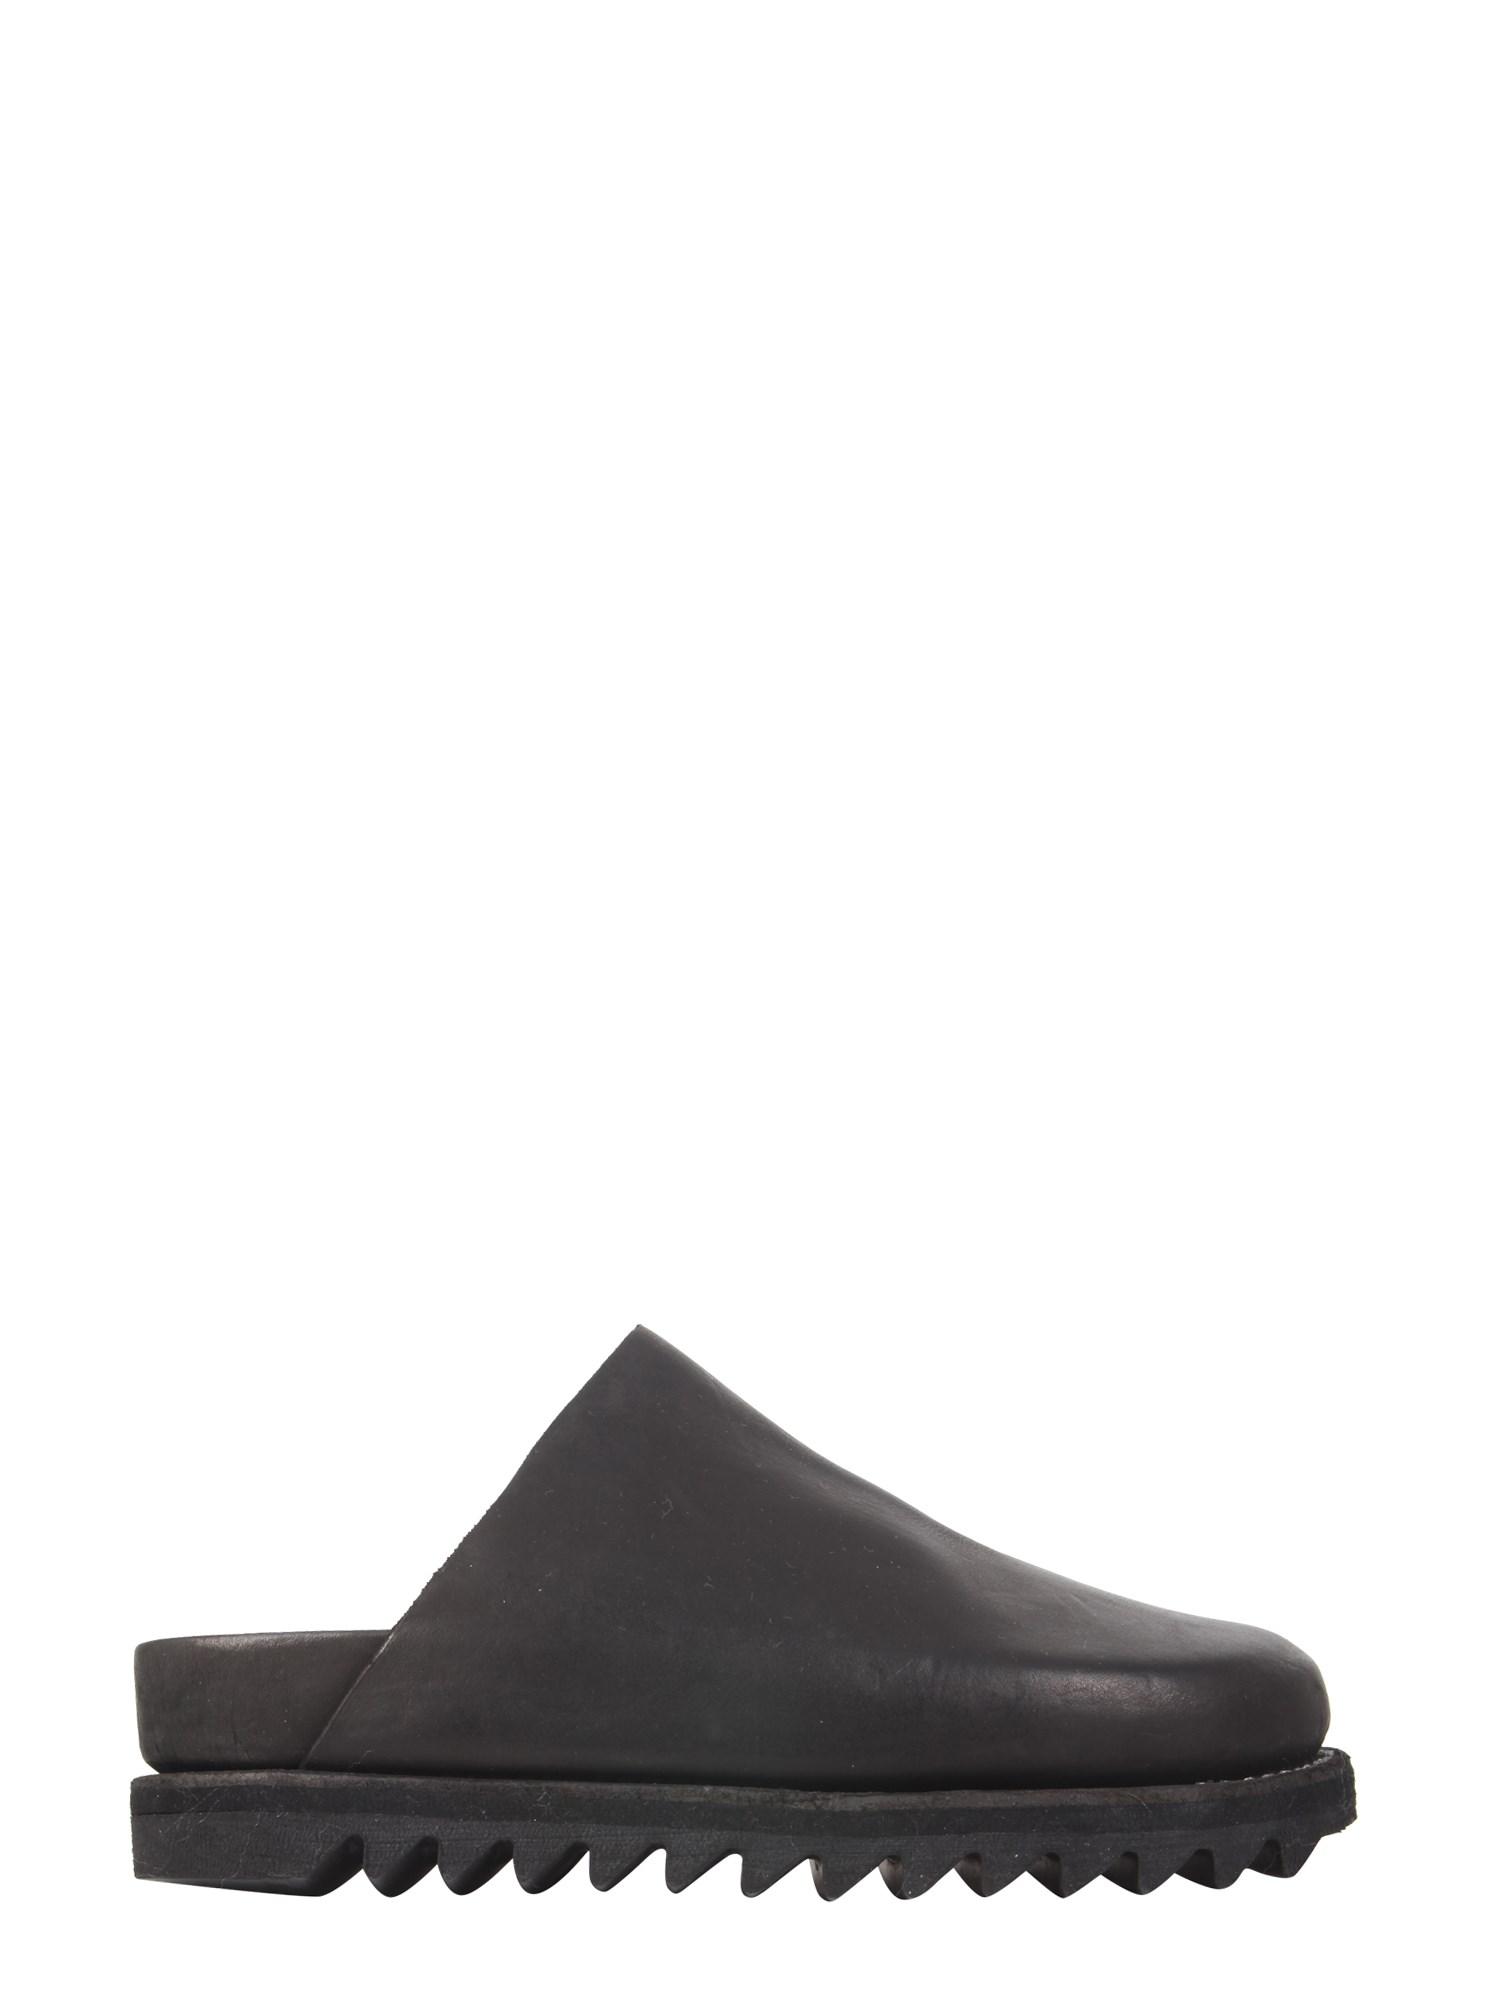 Guidi leather mules - guidi - Modalova